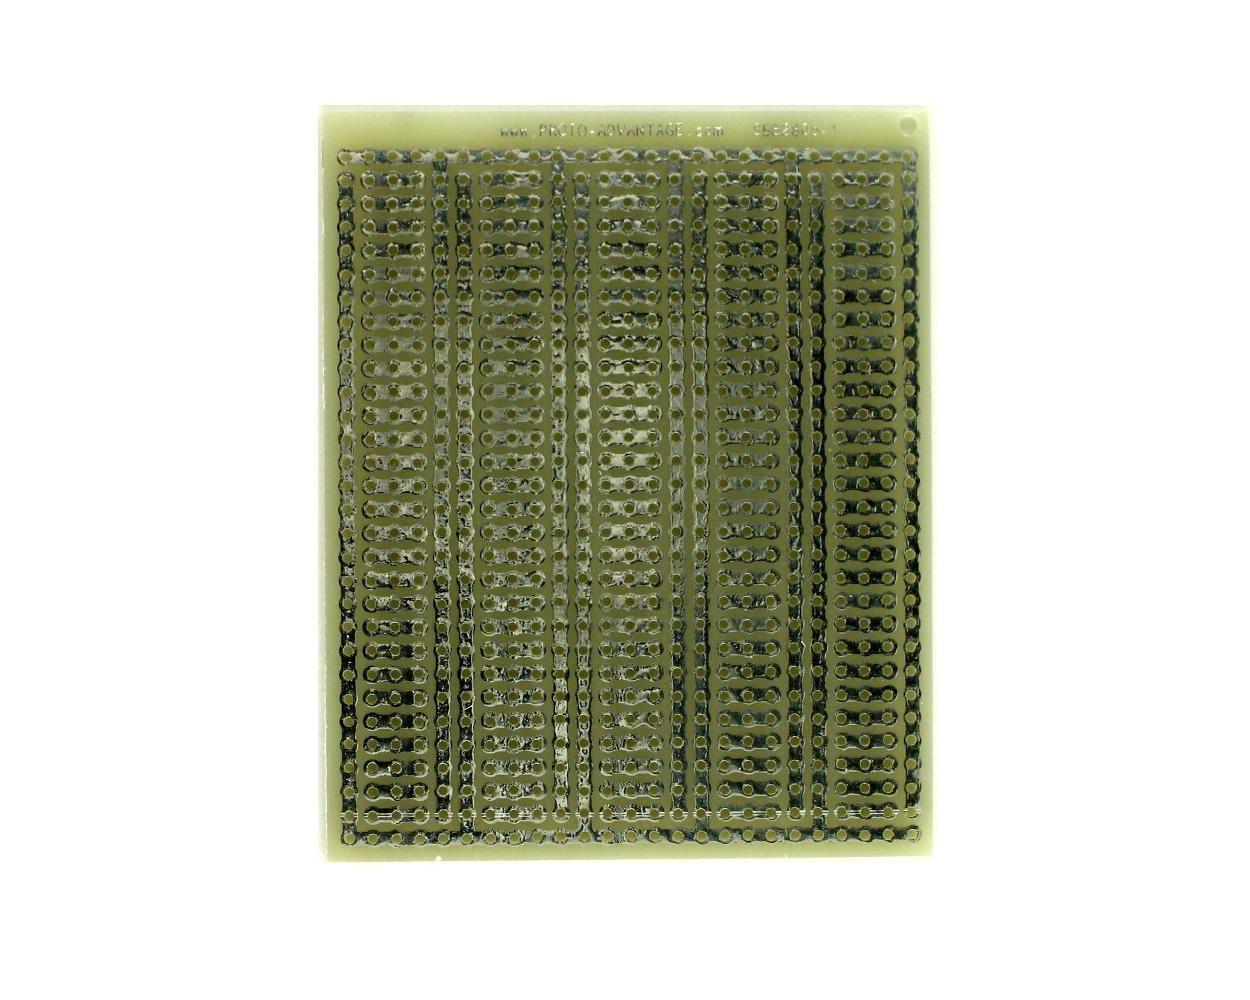 Solder Breadboard (28 row 5 column) 0